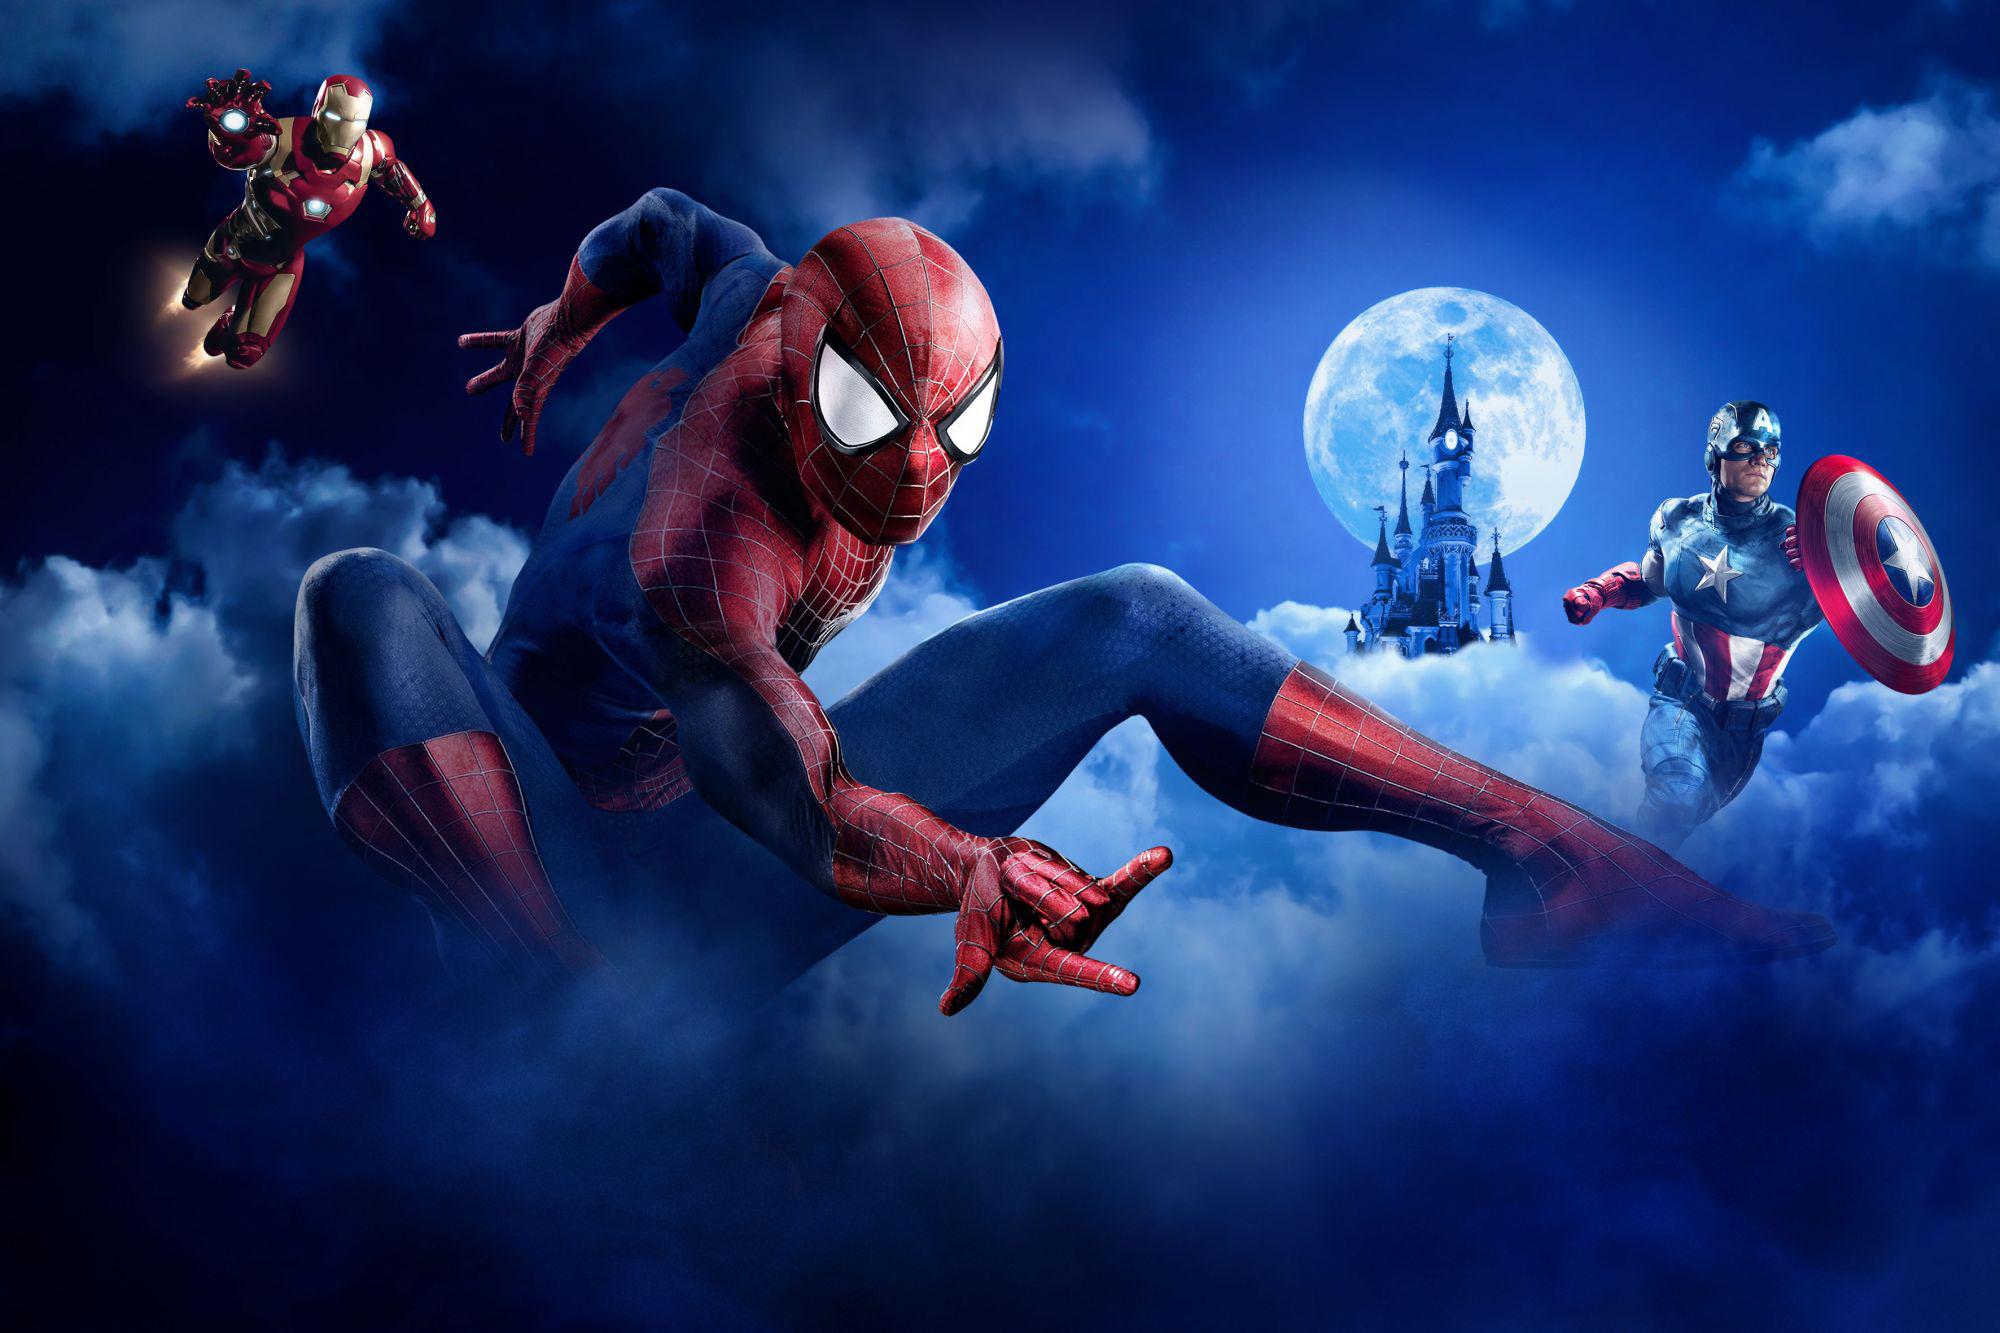 Spiderman iron man captain america hd superheroes 4k - Iron man spiderman wallpaper ...